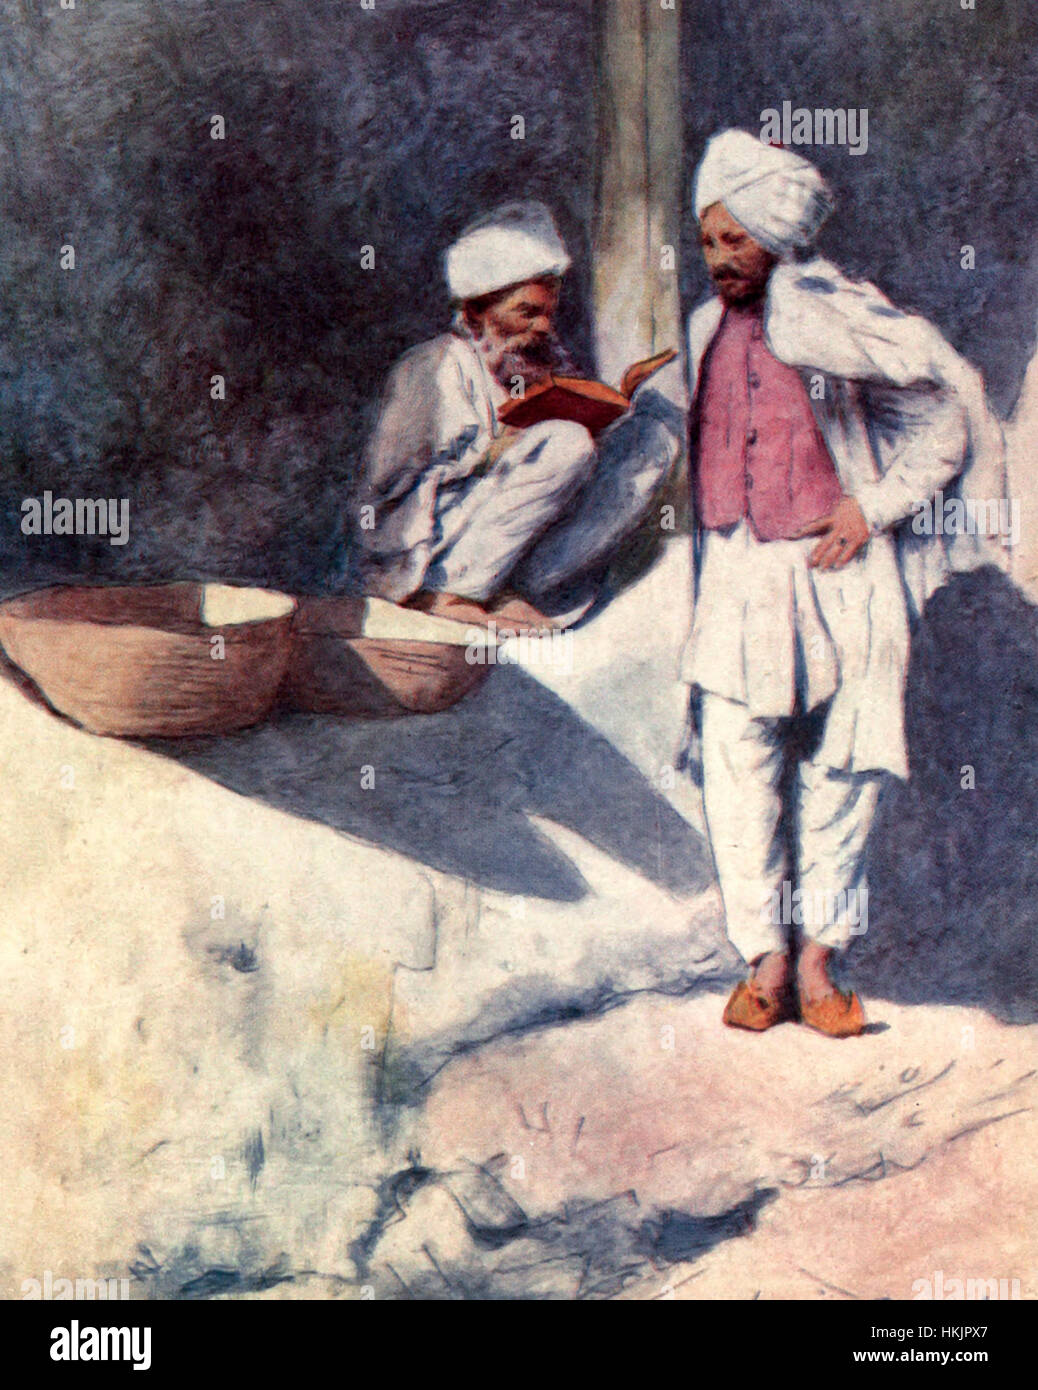 The Village Poet, India, circa 1912 - Stock Image